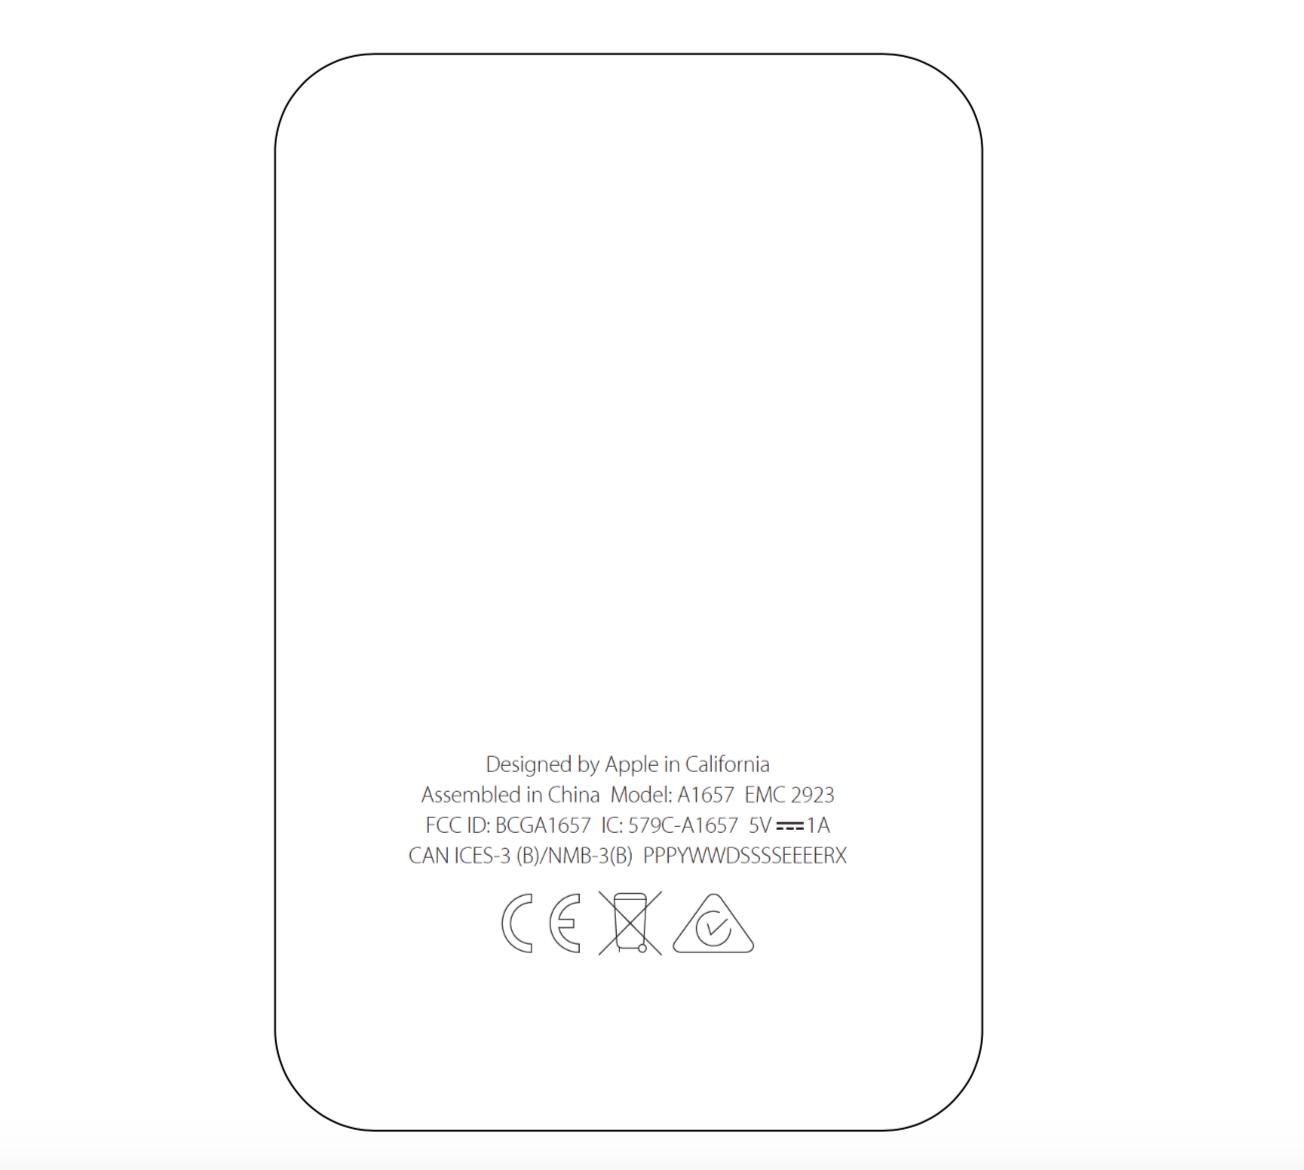 Documentos - Apple Magic Mouse 2 e teclado sem fio